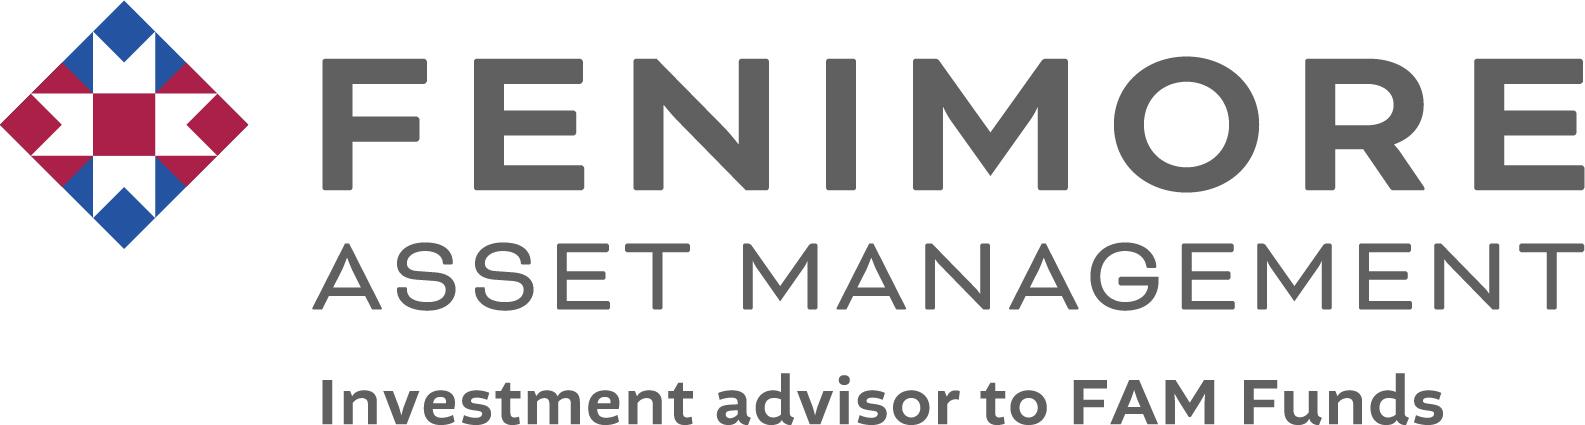 Fenimore Asset Management FAM Funds